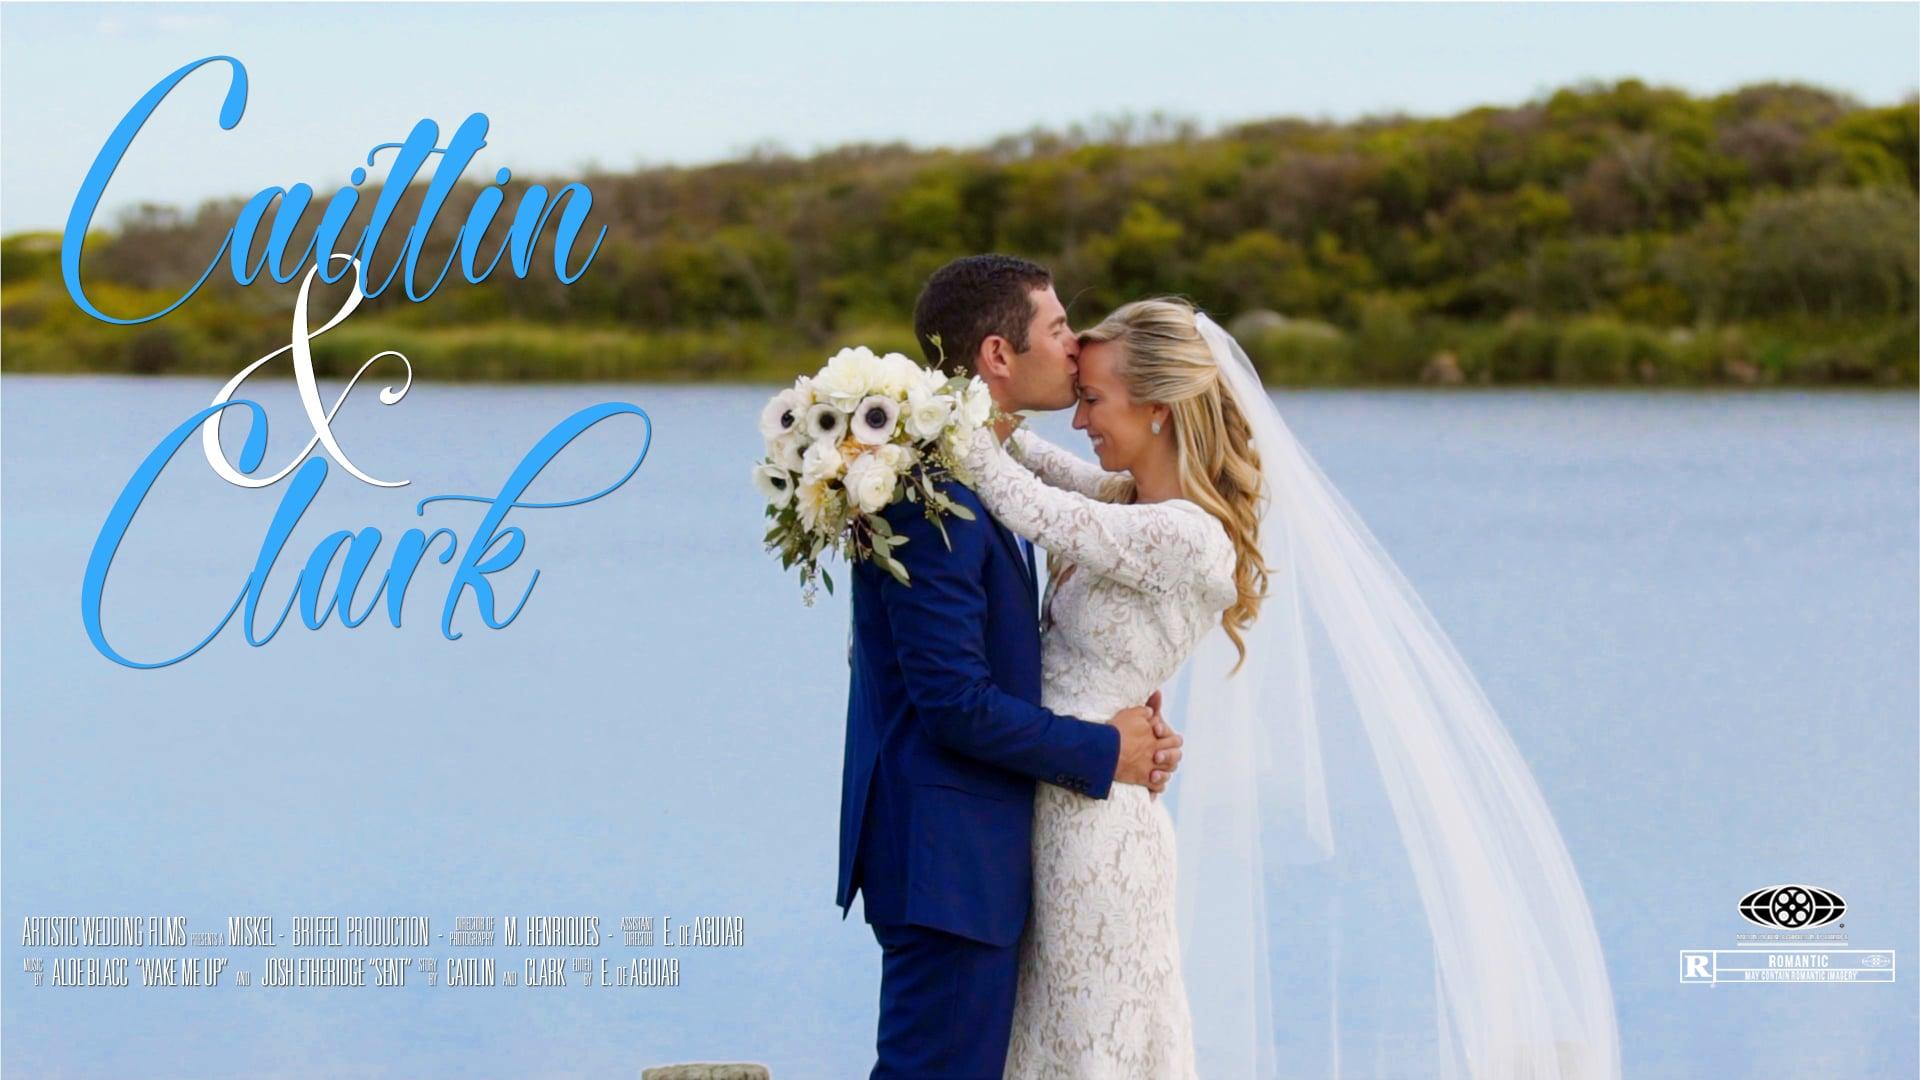 Caitlin & Clark's Wedding Film // Allen Sheep Farm // Martha's Vineyard